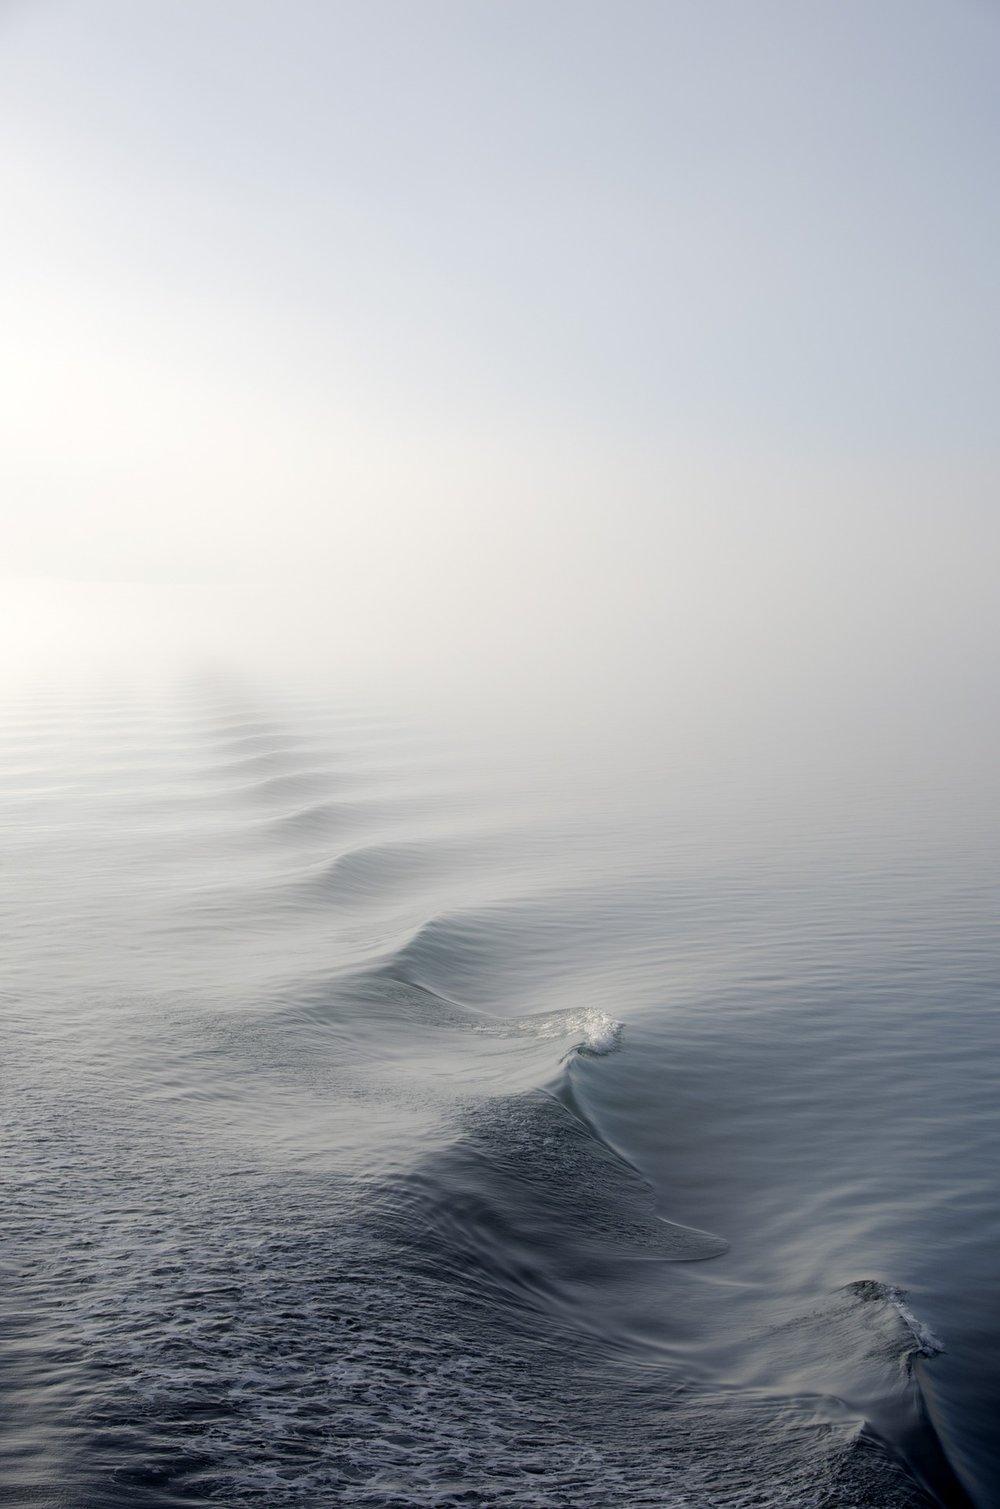 fog-1868416_1920.jpg